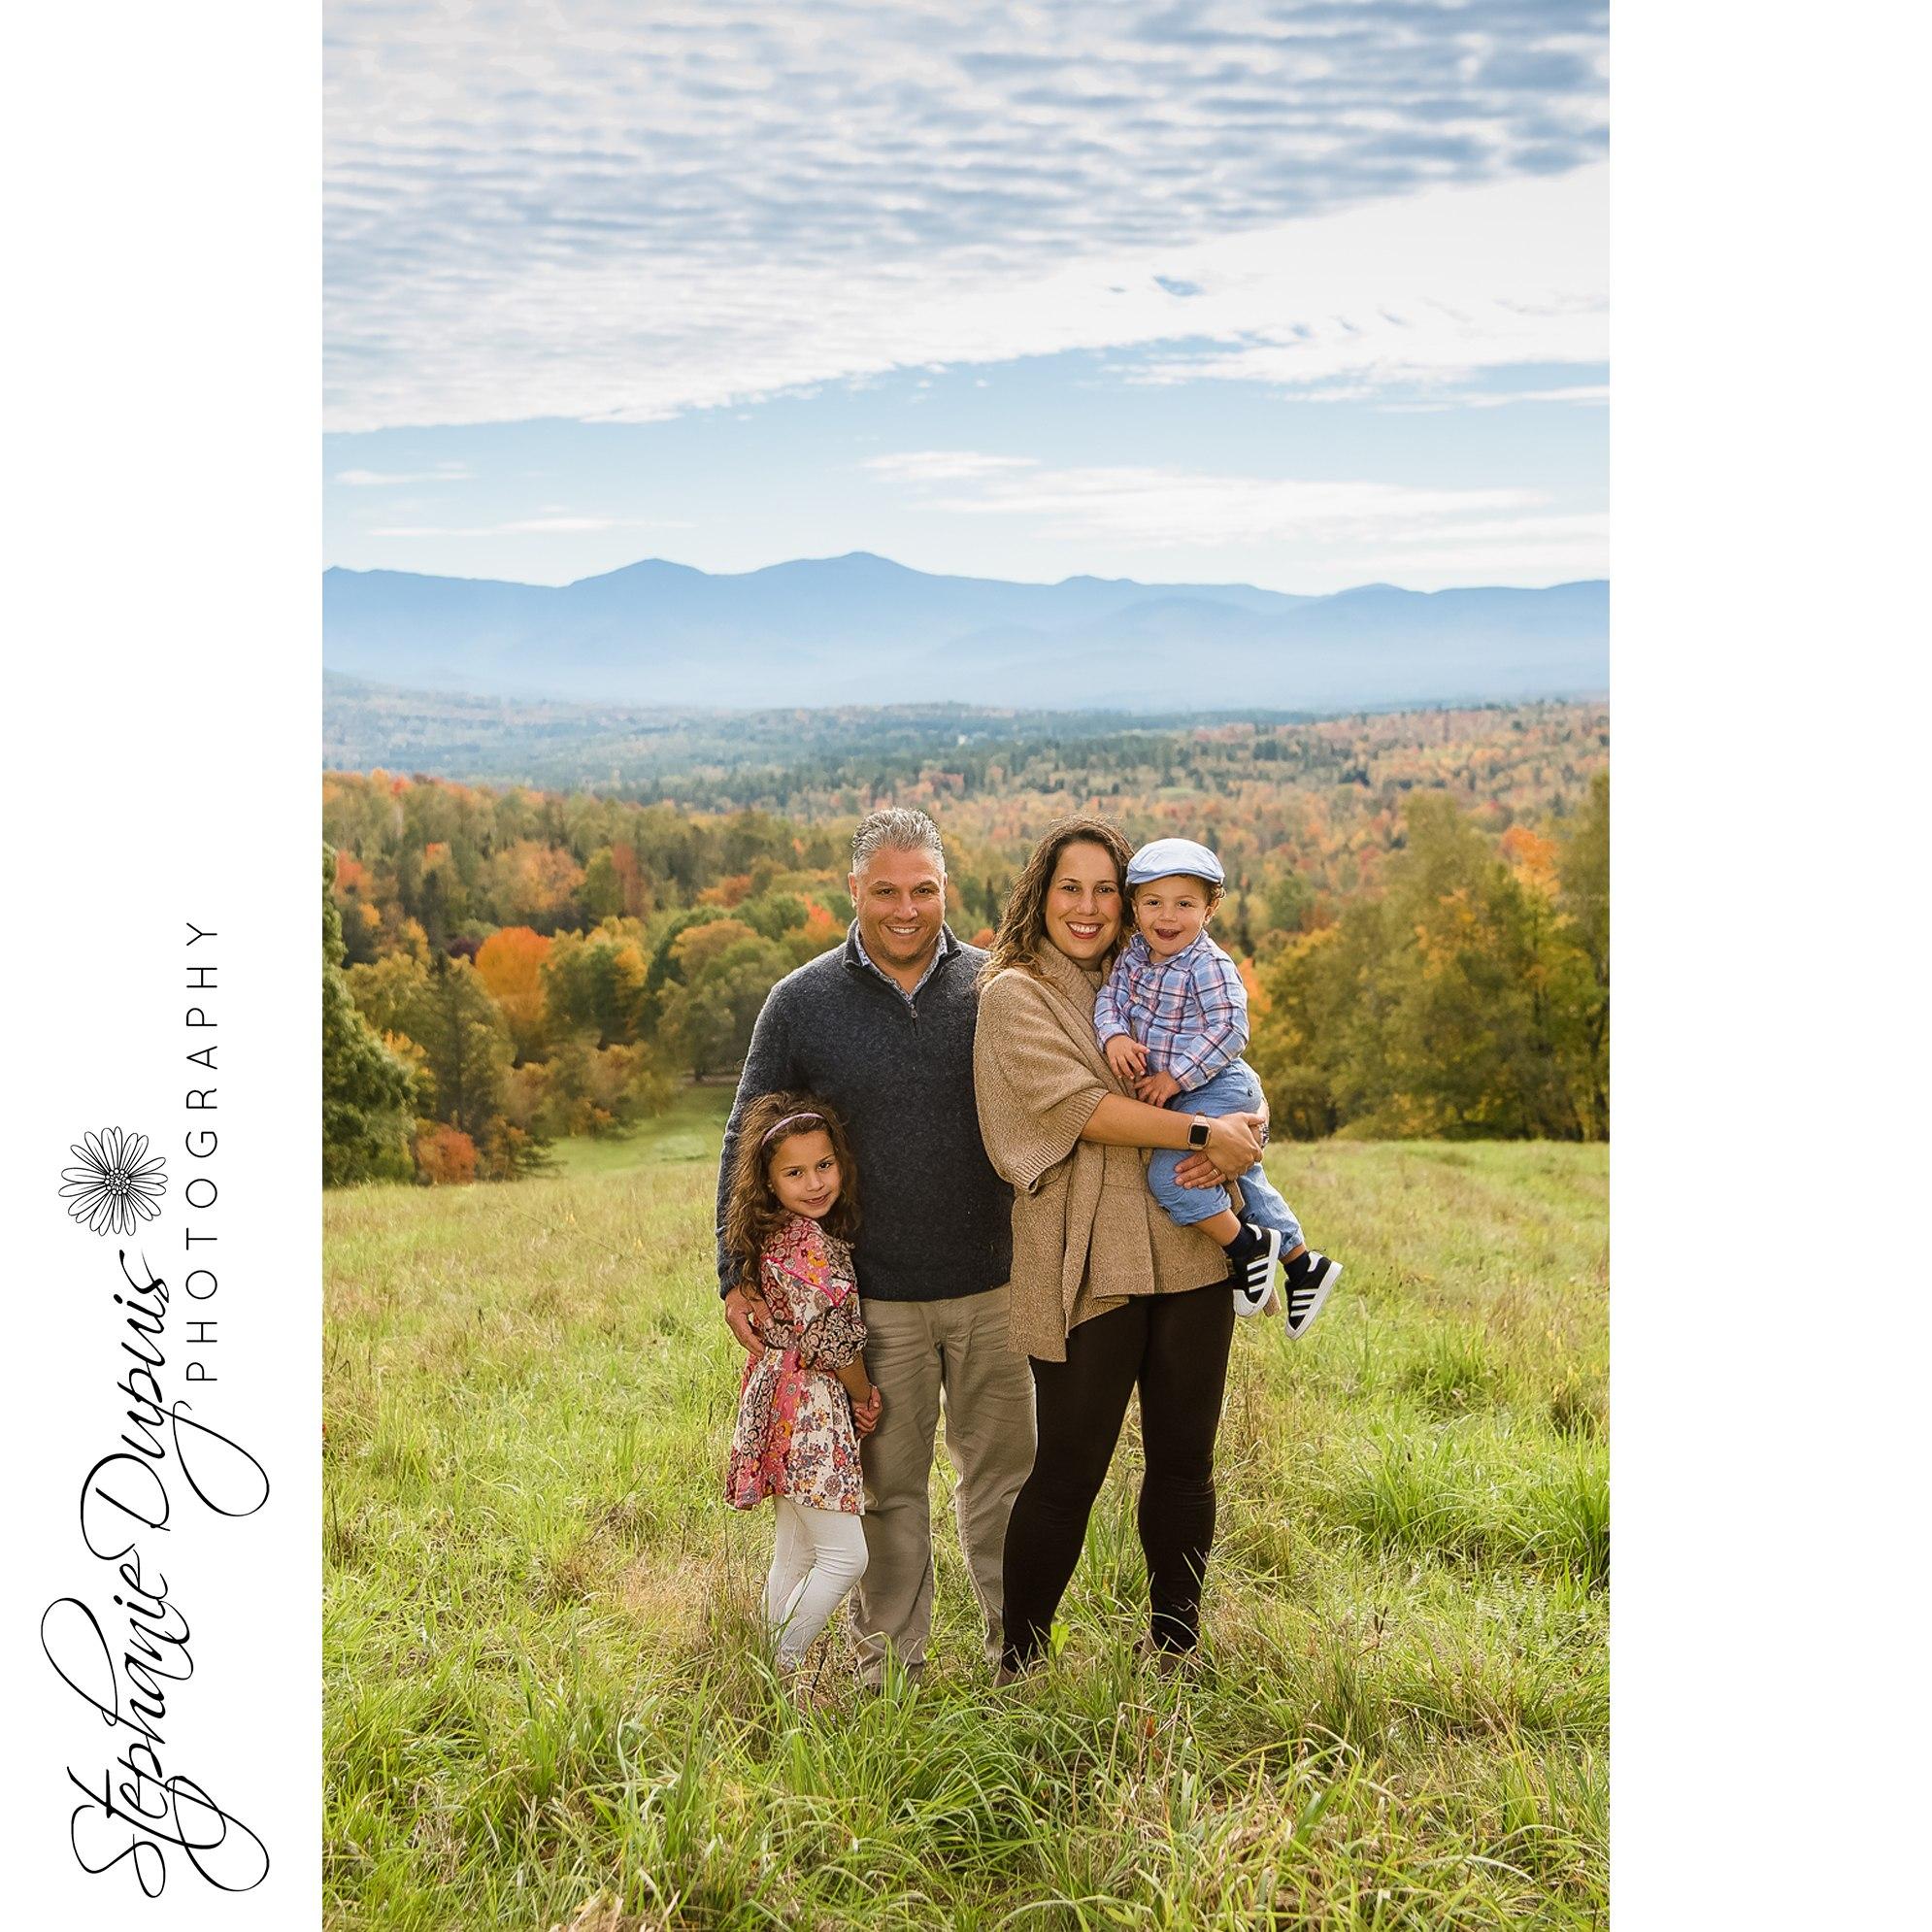 Frisina 4 - Portfolio: Frisina Family